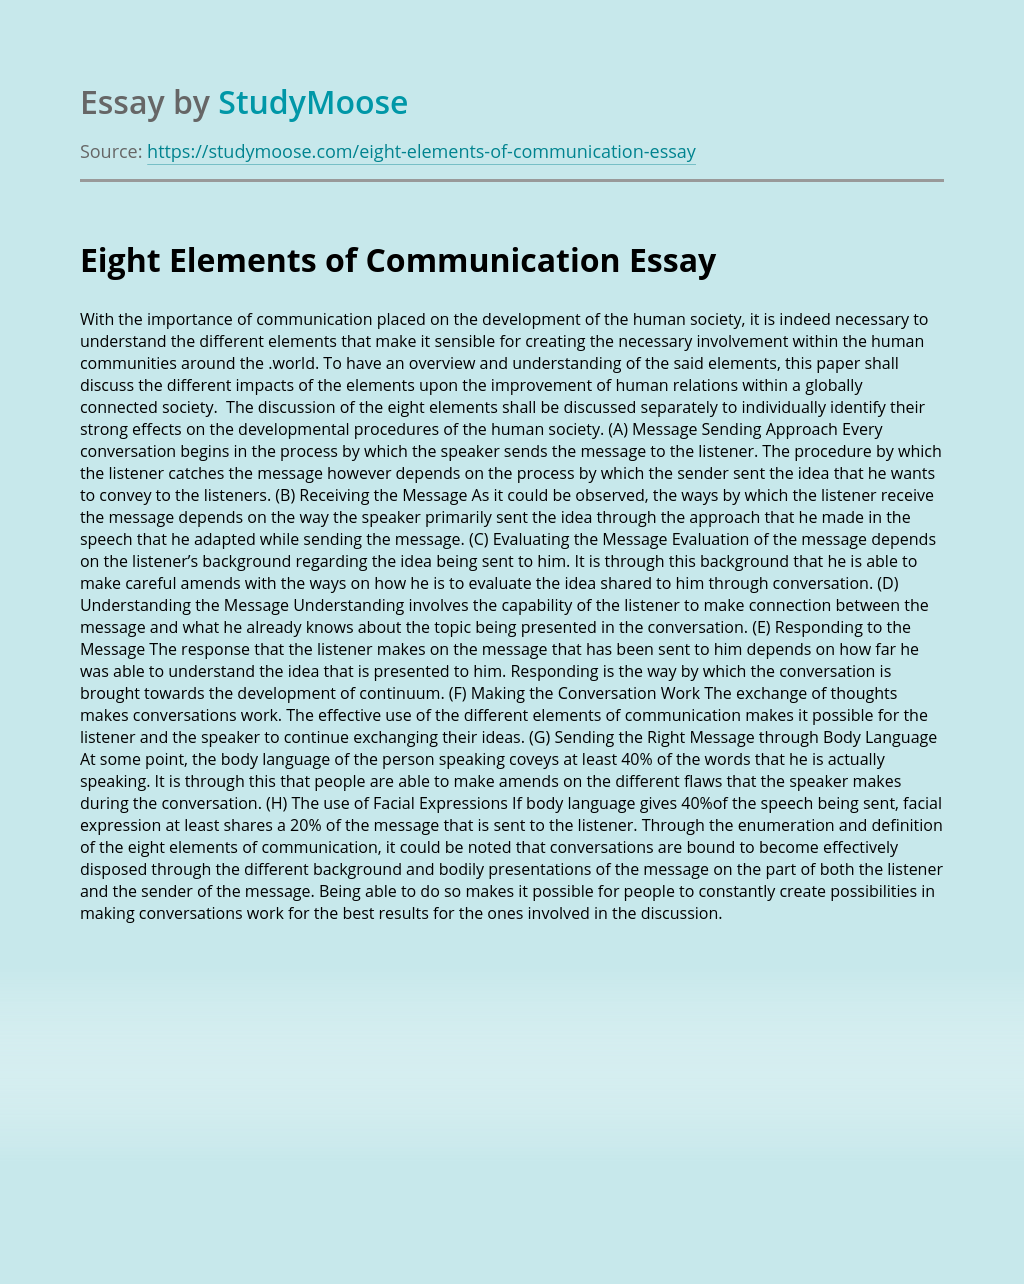 Eight Elements of Communication